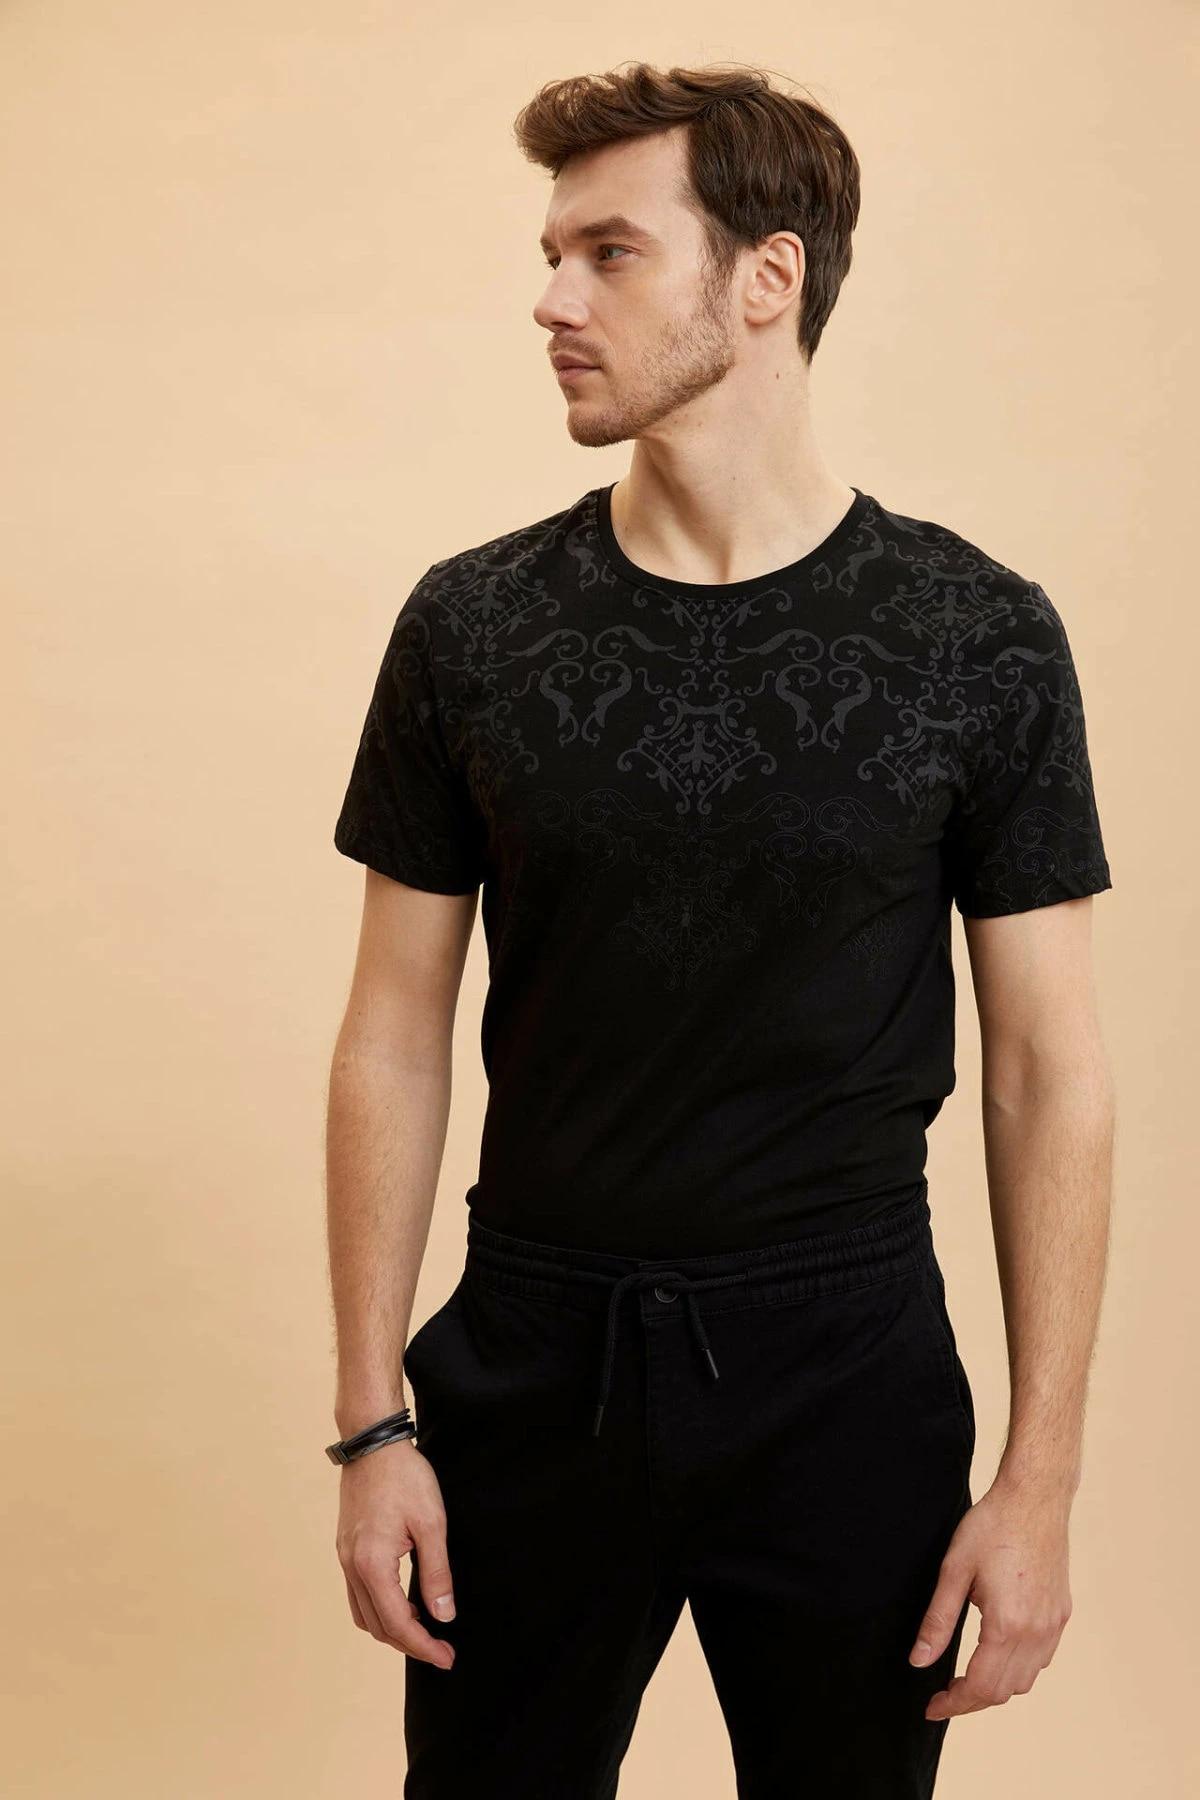 T-Shirt for Men Black Short Sleeve T-Shirts Top Men Tees